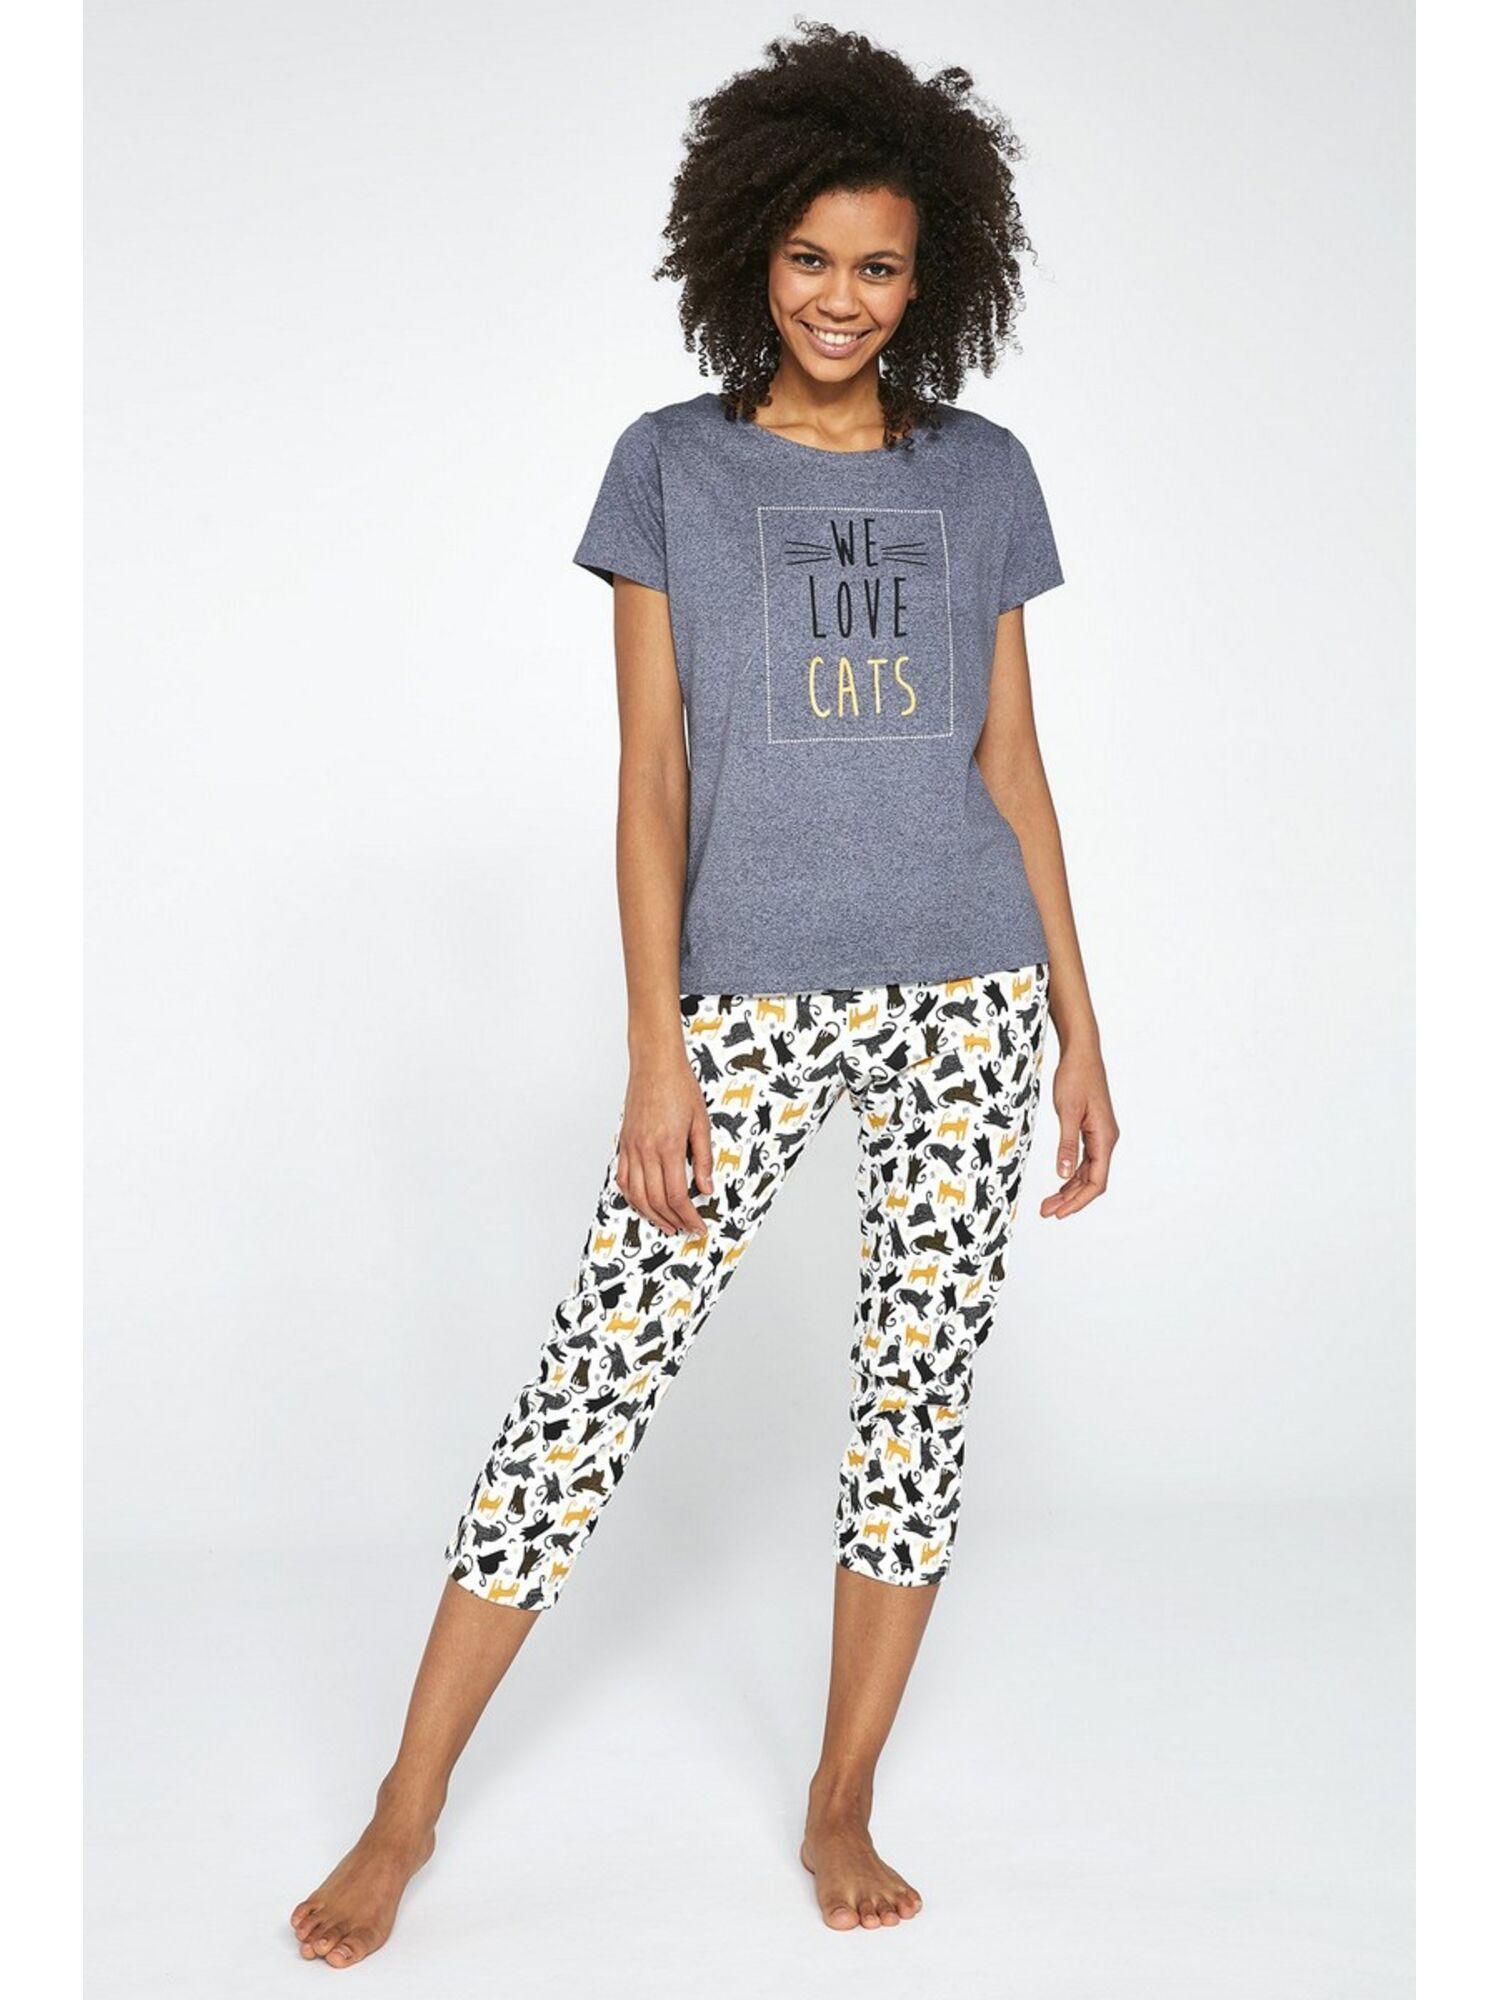 Пижама женская со штанами 497 LOVE CATS, серый, Cornette